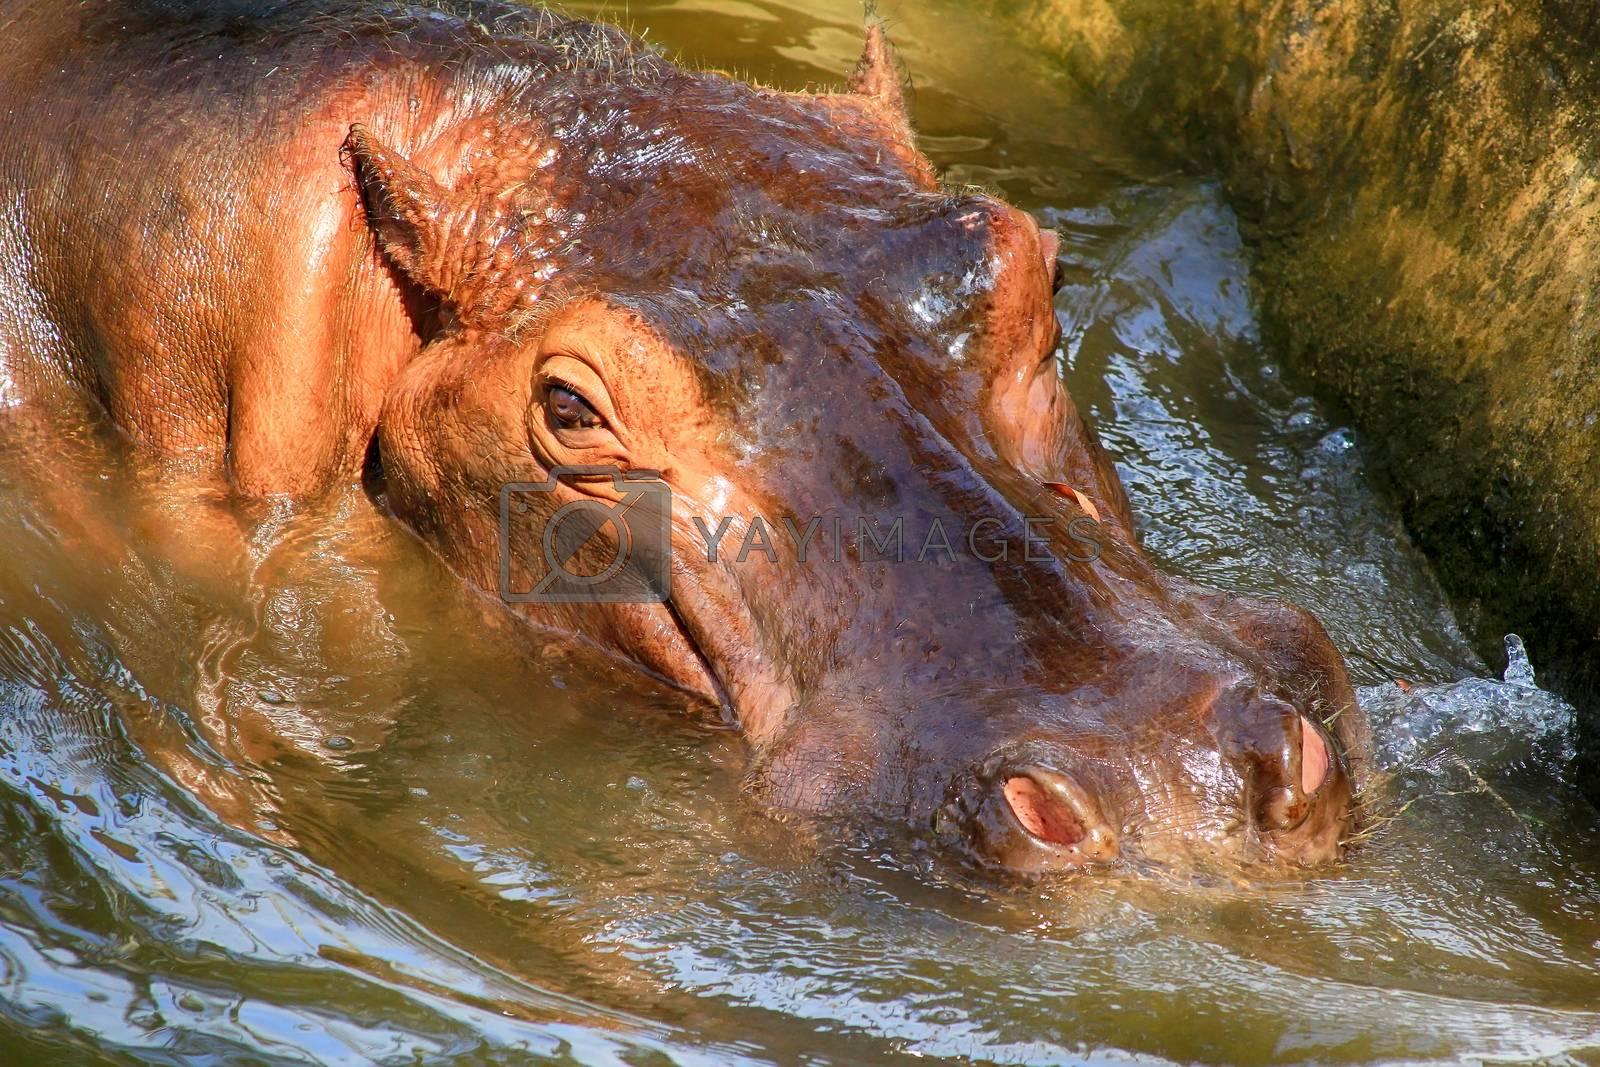 Hippopotamus, (Hippopotamus amphibius), head just above water, showing big eye and hairs on nostrils